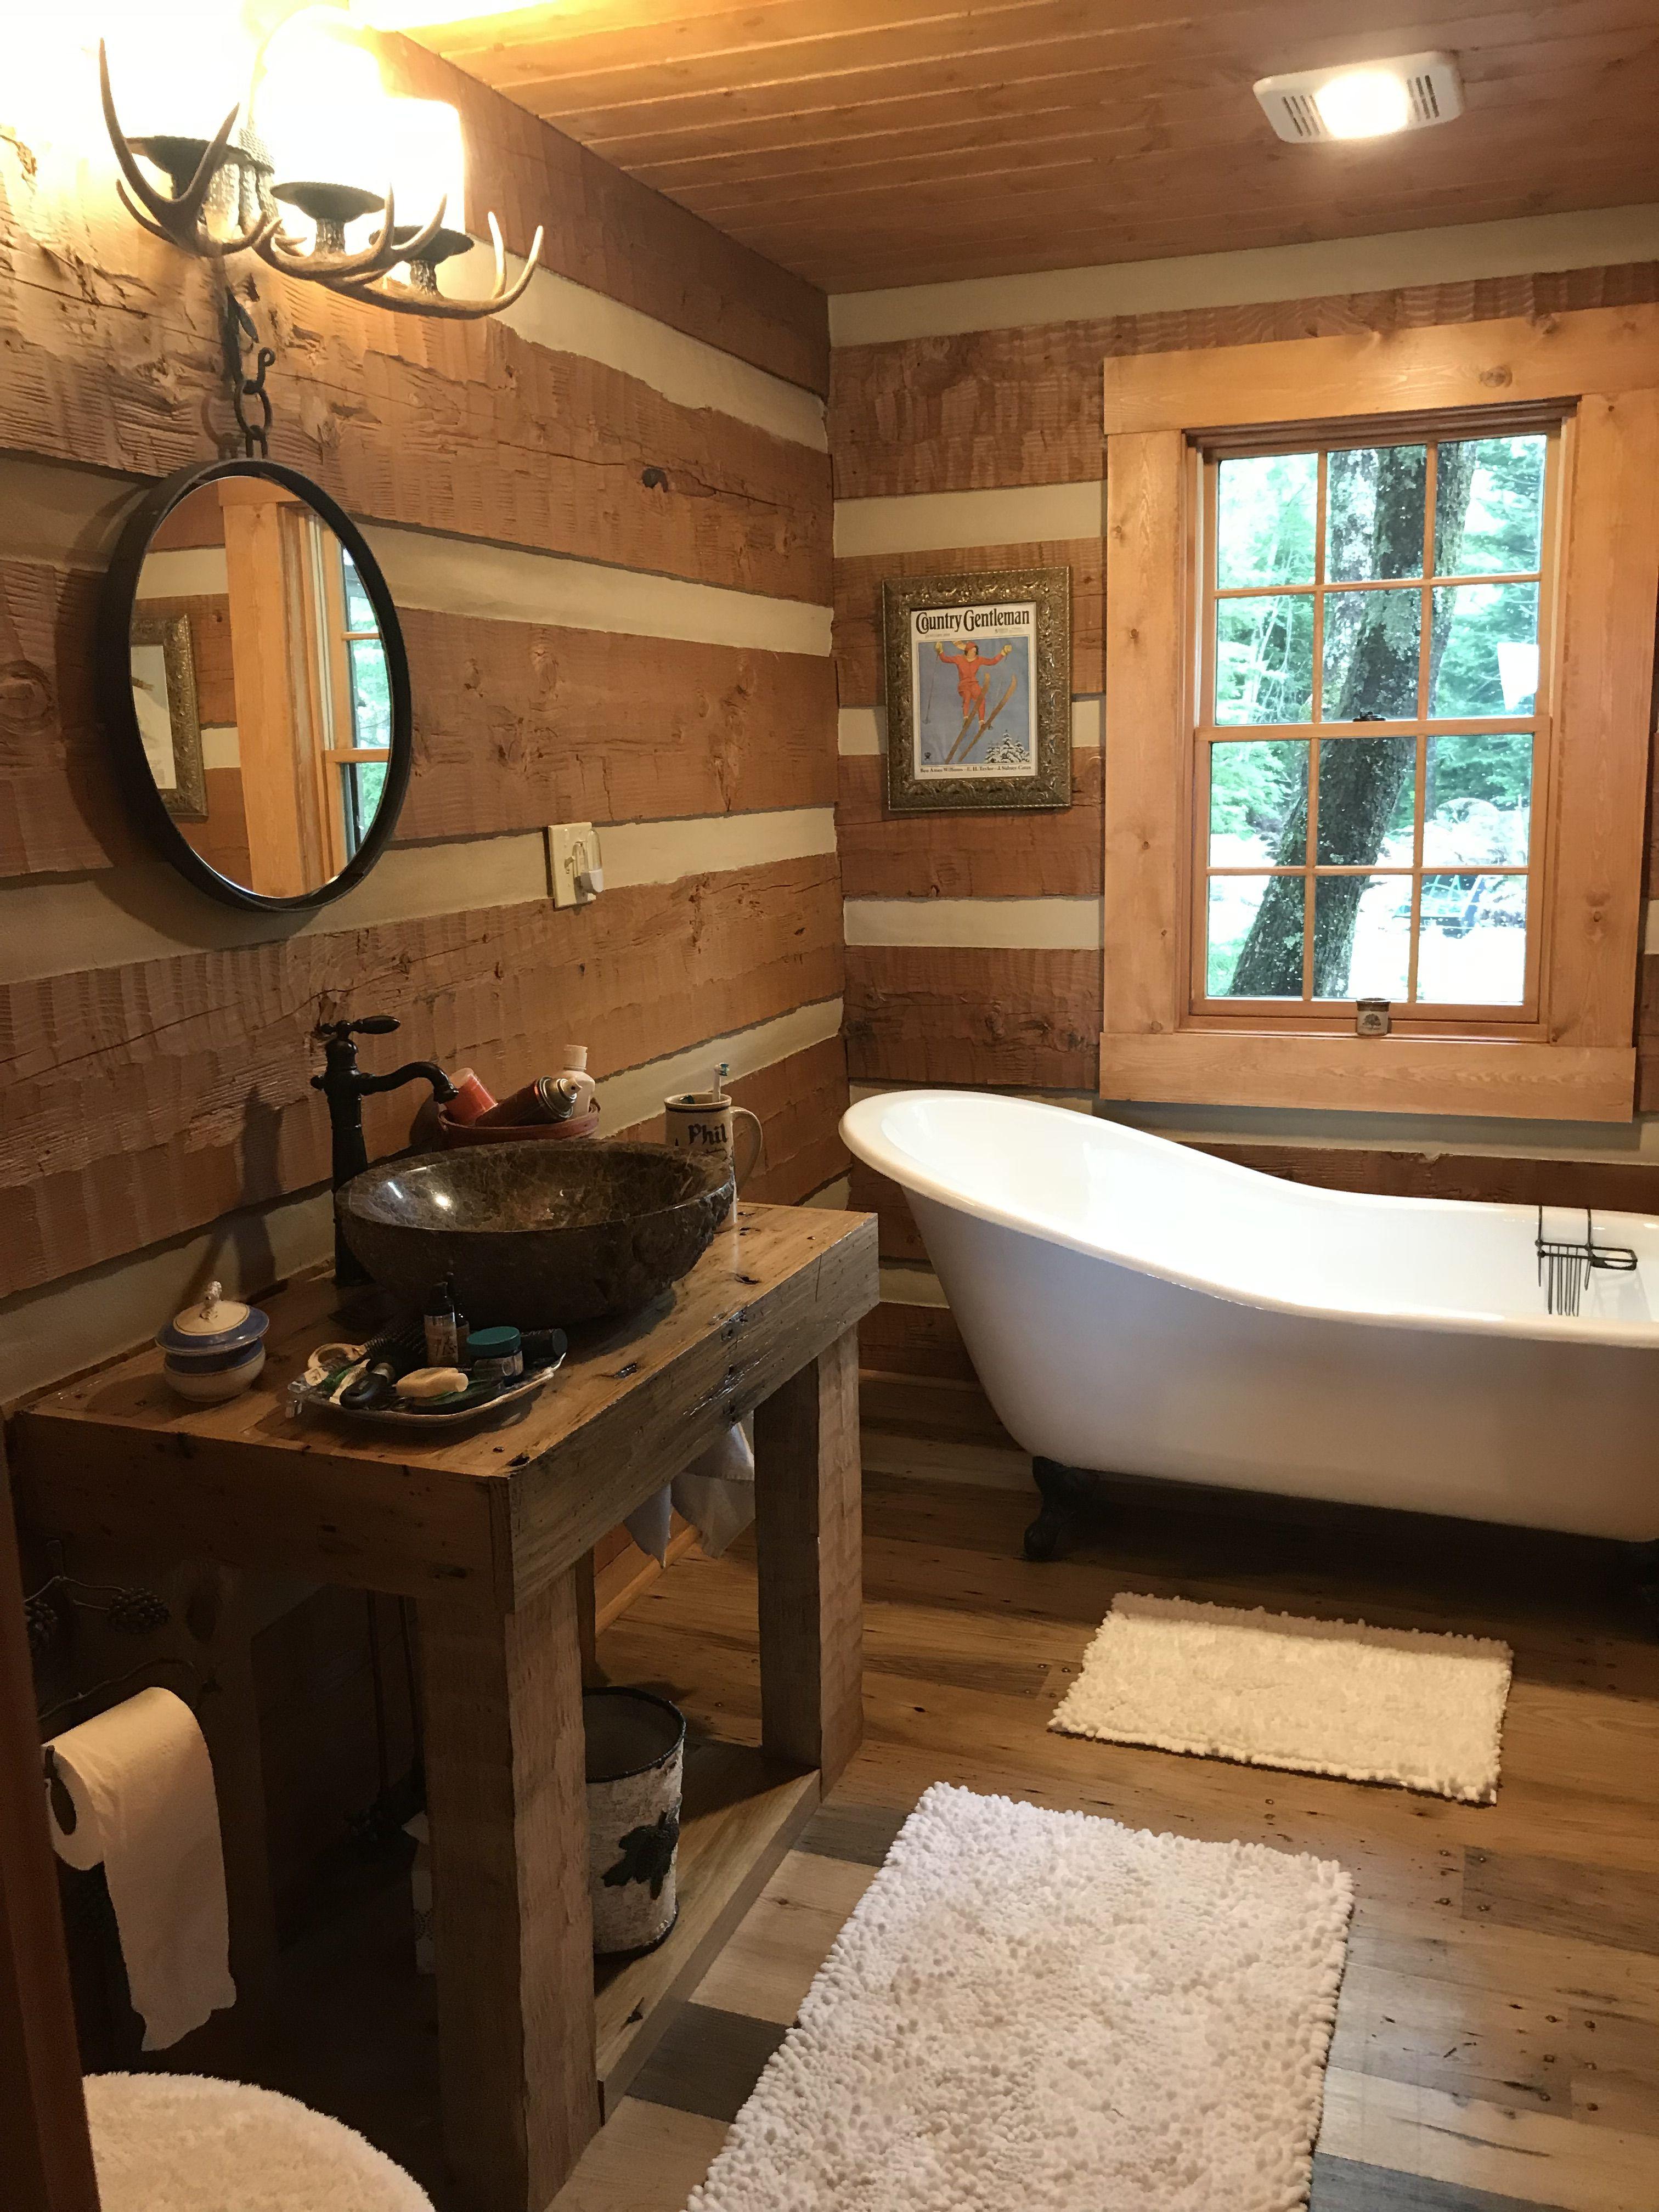 Loghome Bathroom With Handmade Vanity Claw Foot Tub Log Home Bathrooms Rustic Cabin Bathroom Log Cabin Bathrooms